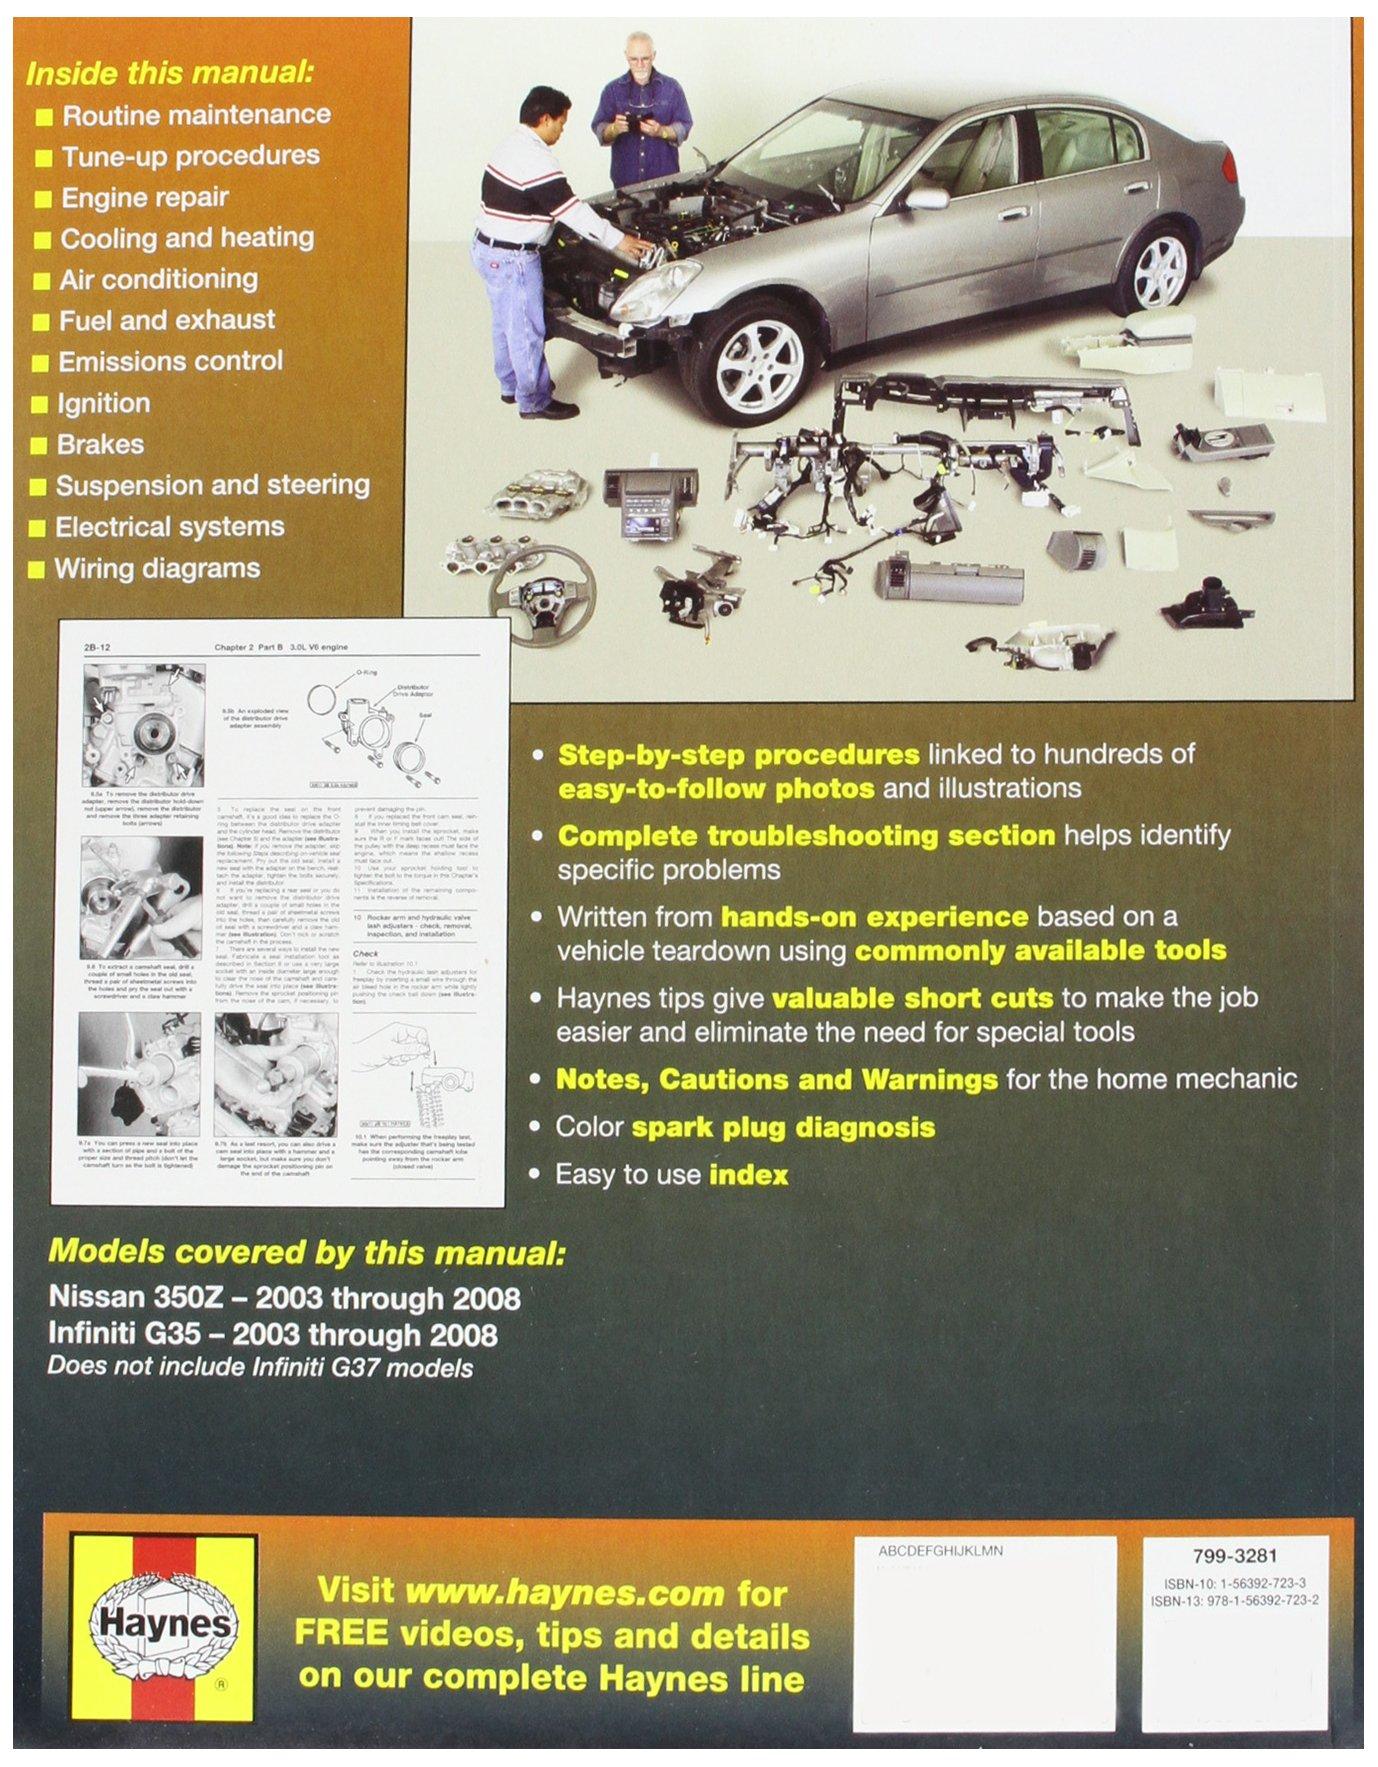 2004 Nissan 350z Car Workshop Service Manual Ebook Stiga Comfort 16 2010 Parts Diagram Engine Briggs Stratton Repairmanualspro Array Haynes Automotive Repair For And Infiniti G35 Rh Amazon Com